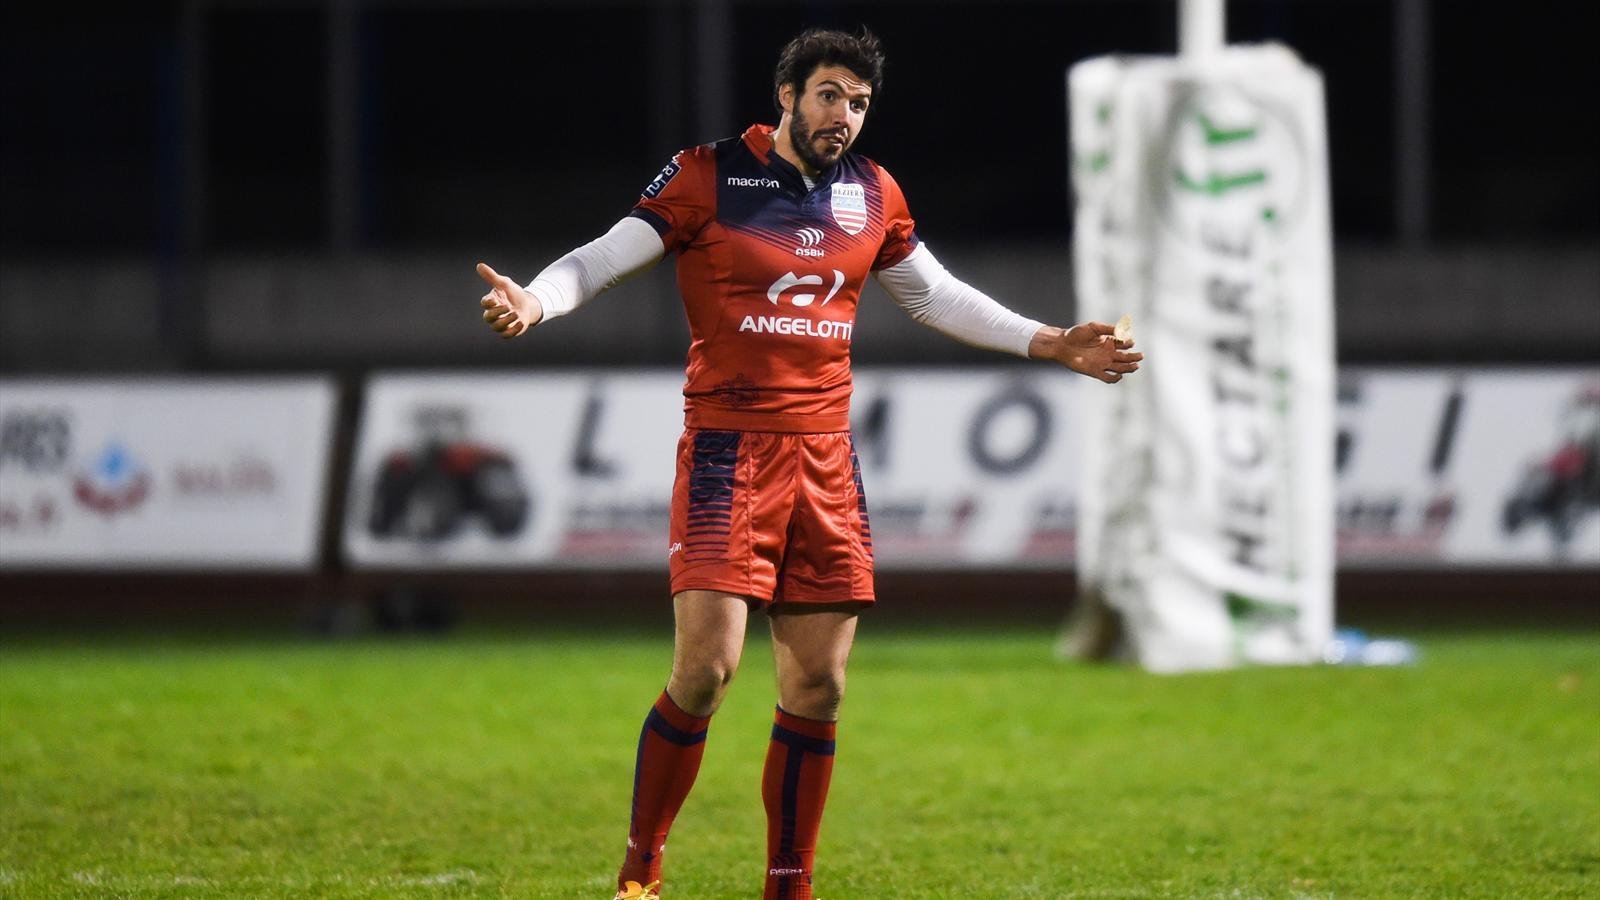 Jean-Baptiste Peyras Loustalet (Béziers) - 19 février 2016